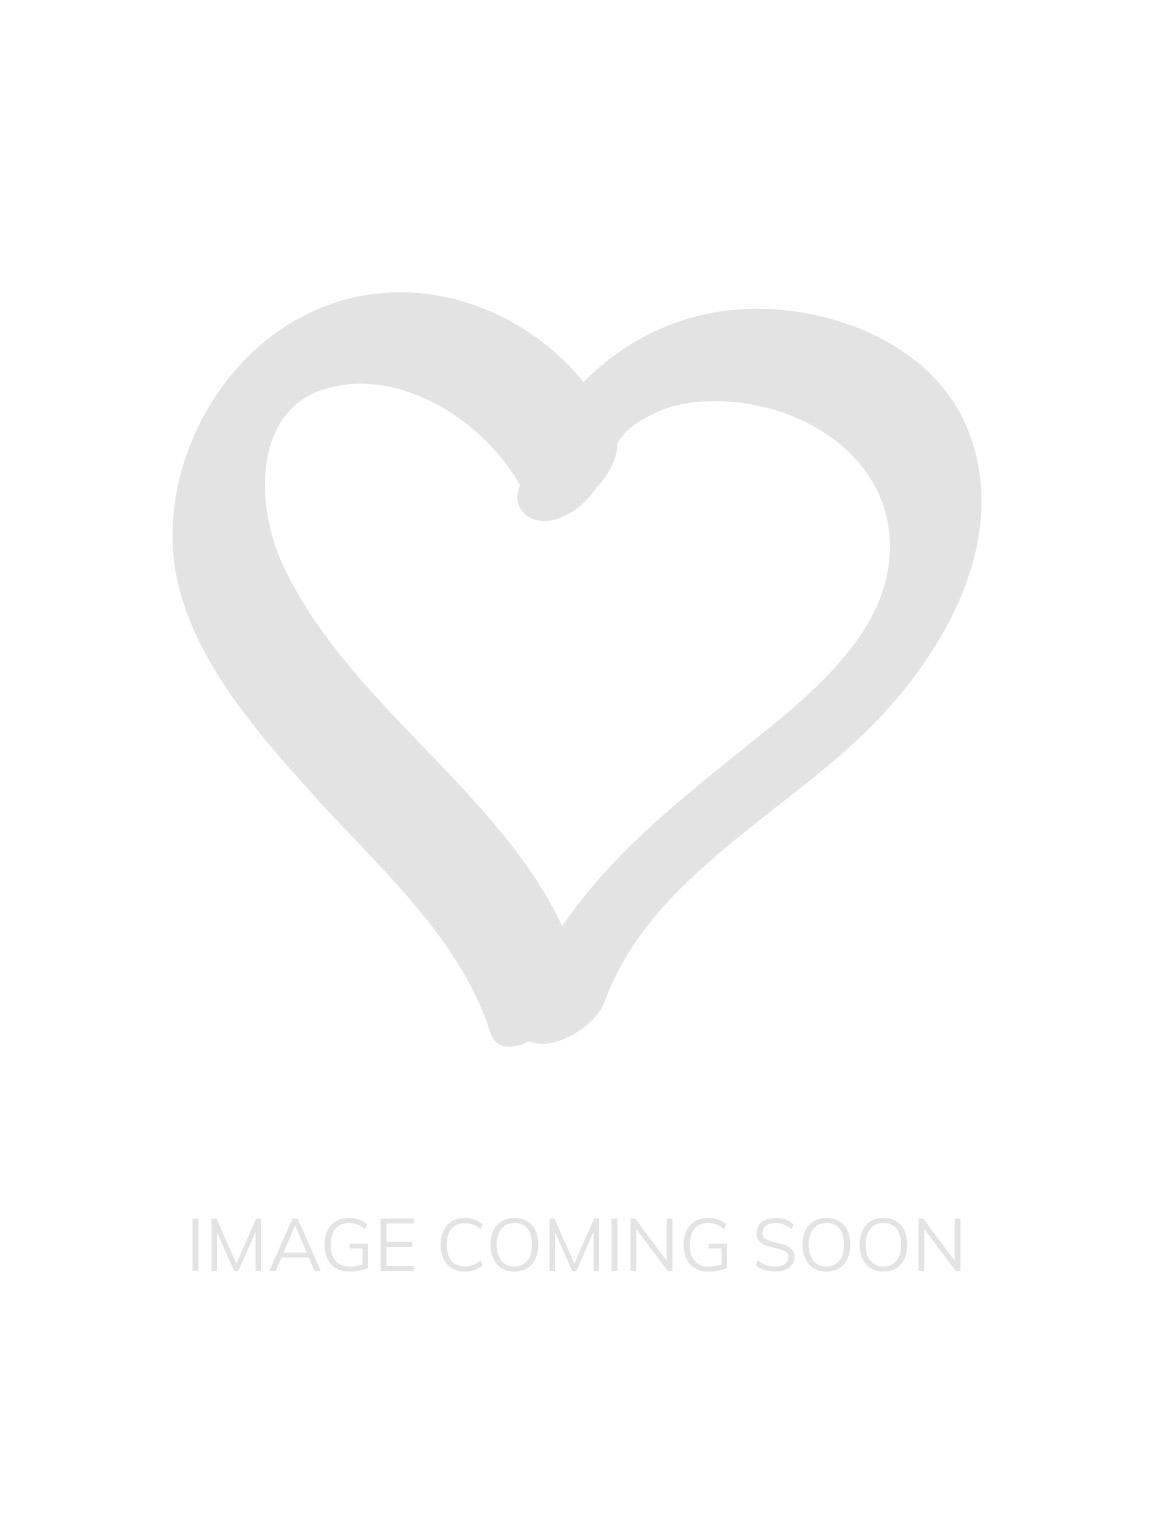 Fantasie Lingerie Premiere Brief//Knickers 9115